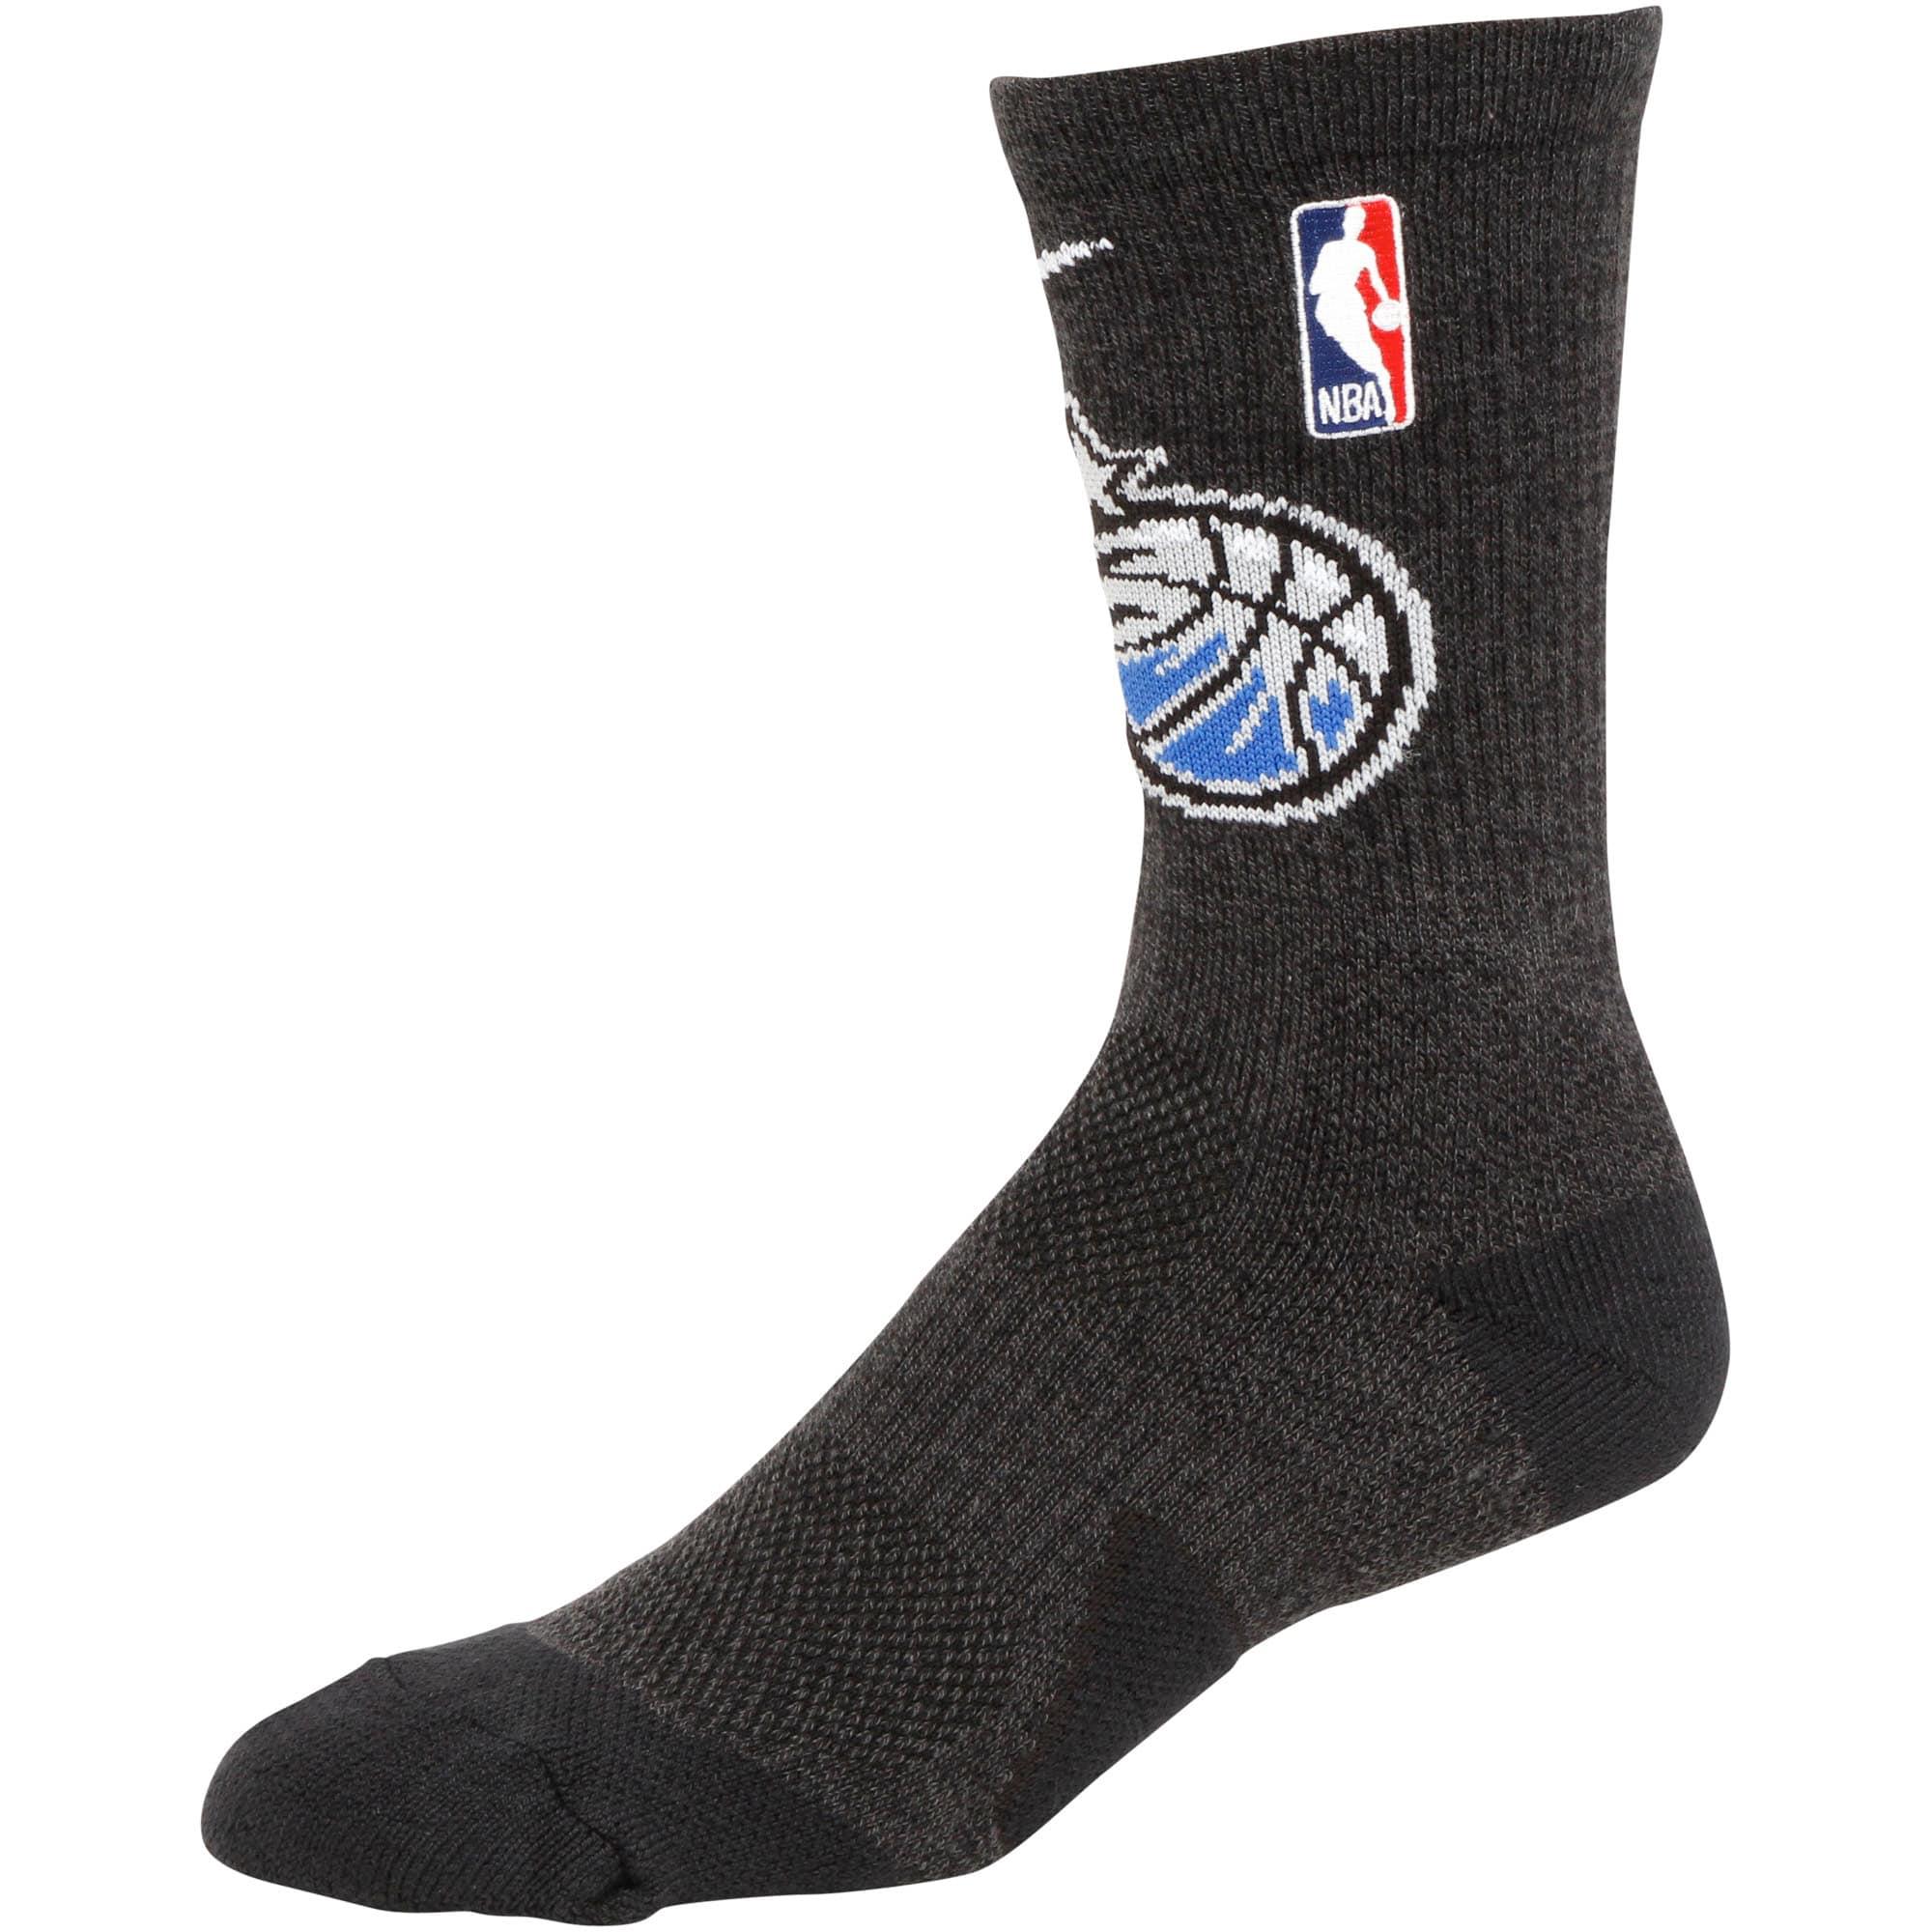 Orlando Magic Nike Elite Team Performance Crew Socks - Black